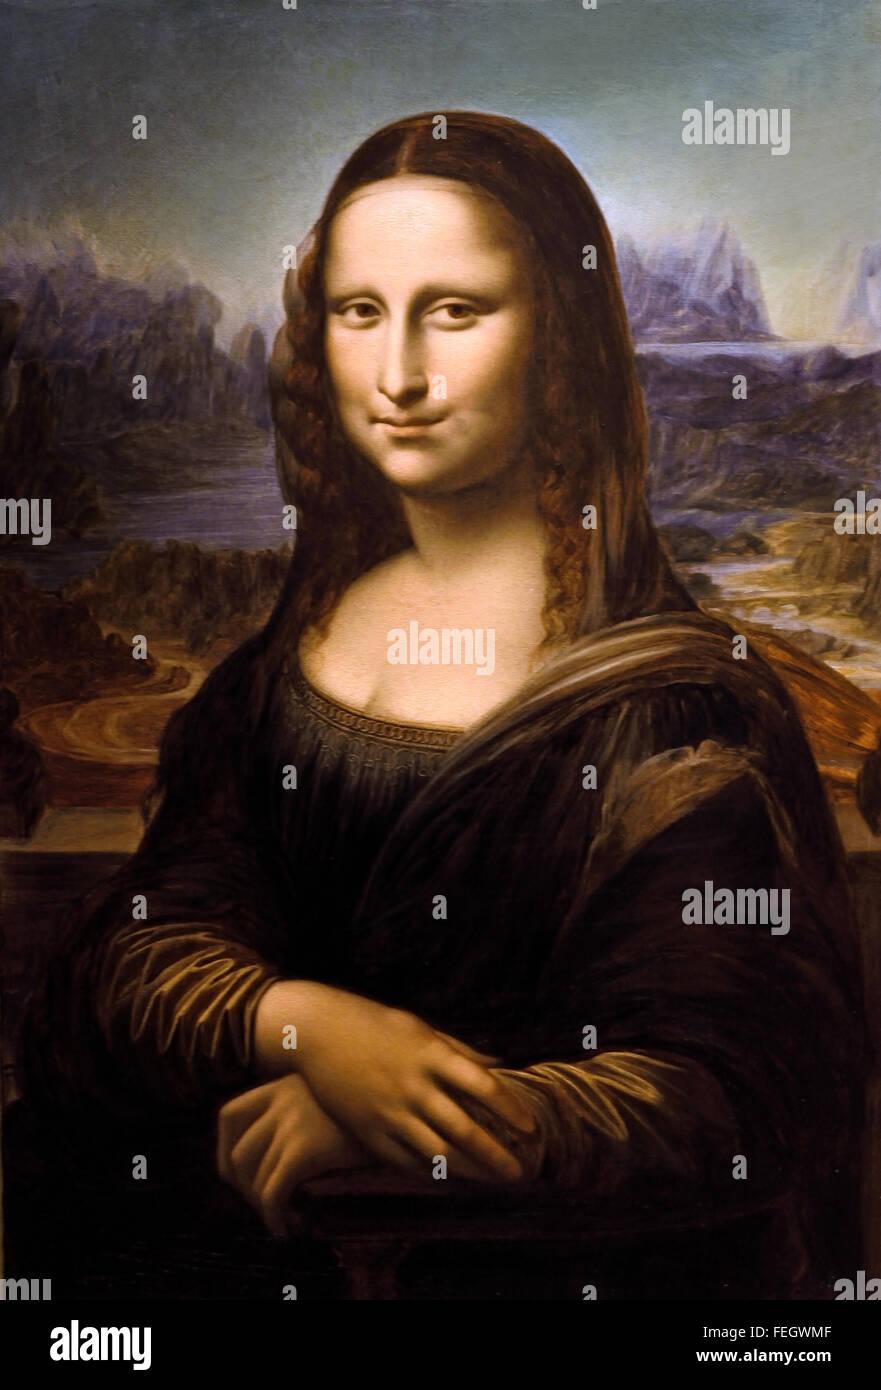 Extrêmement La Joconde vers - Mona Lisa about 1877 Giovanni Rota 1800-1877  AW56